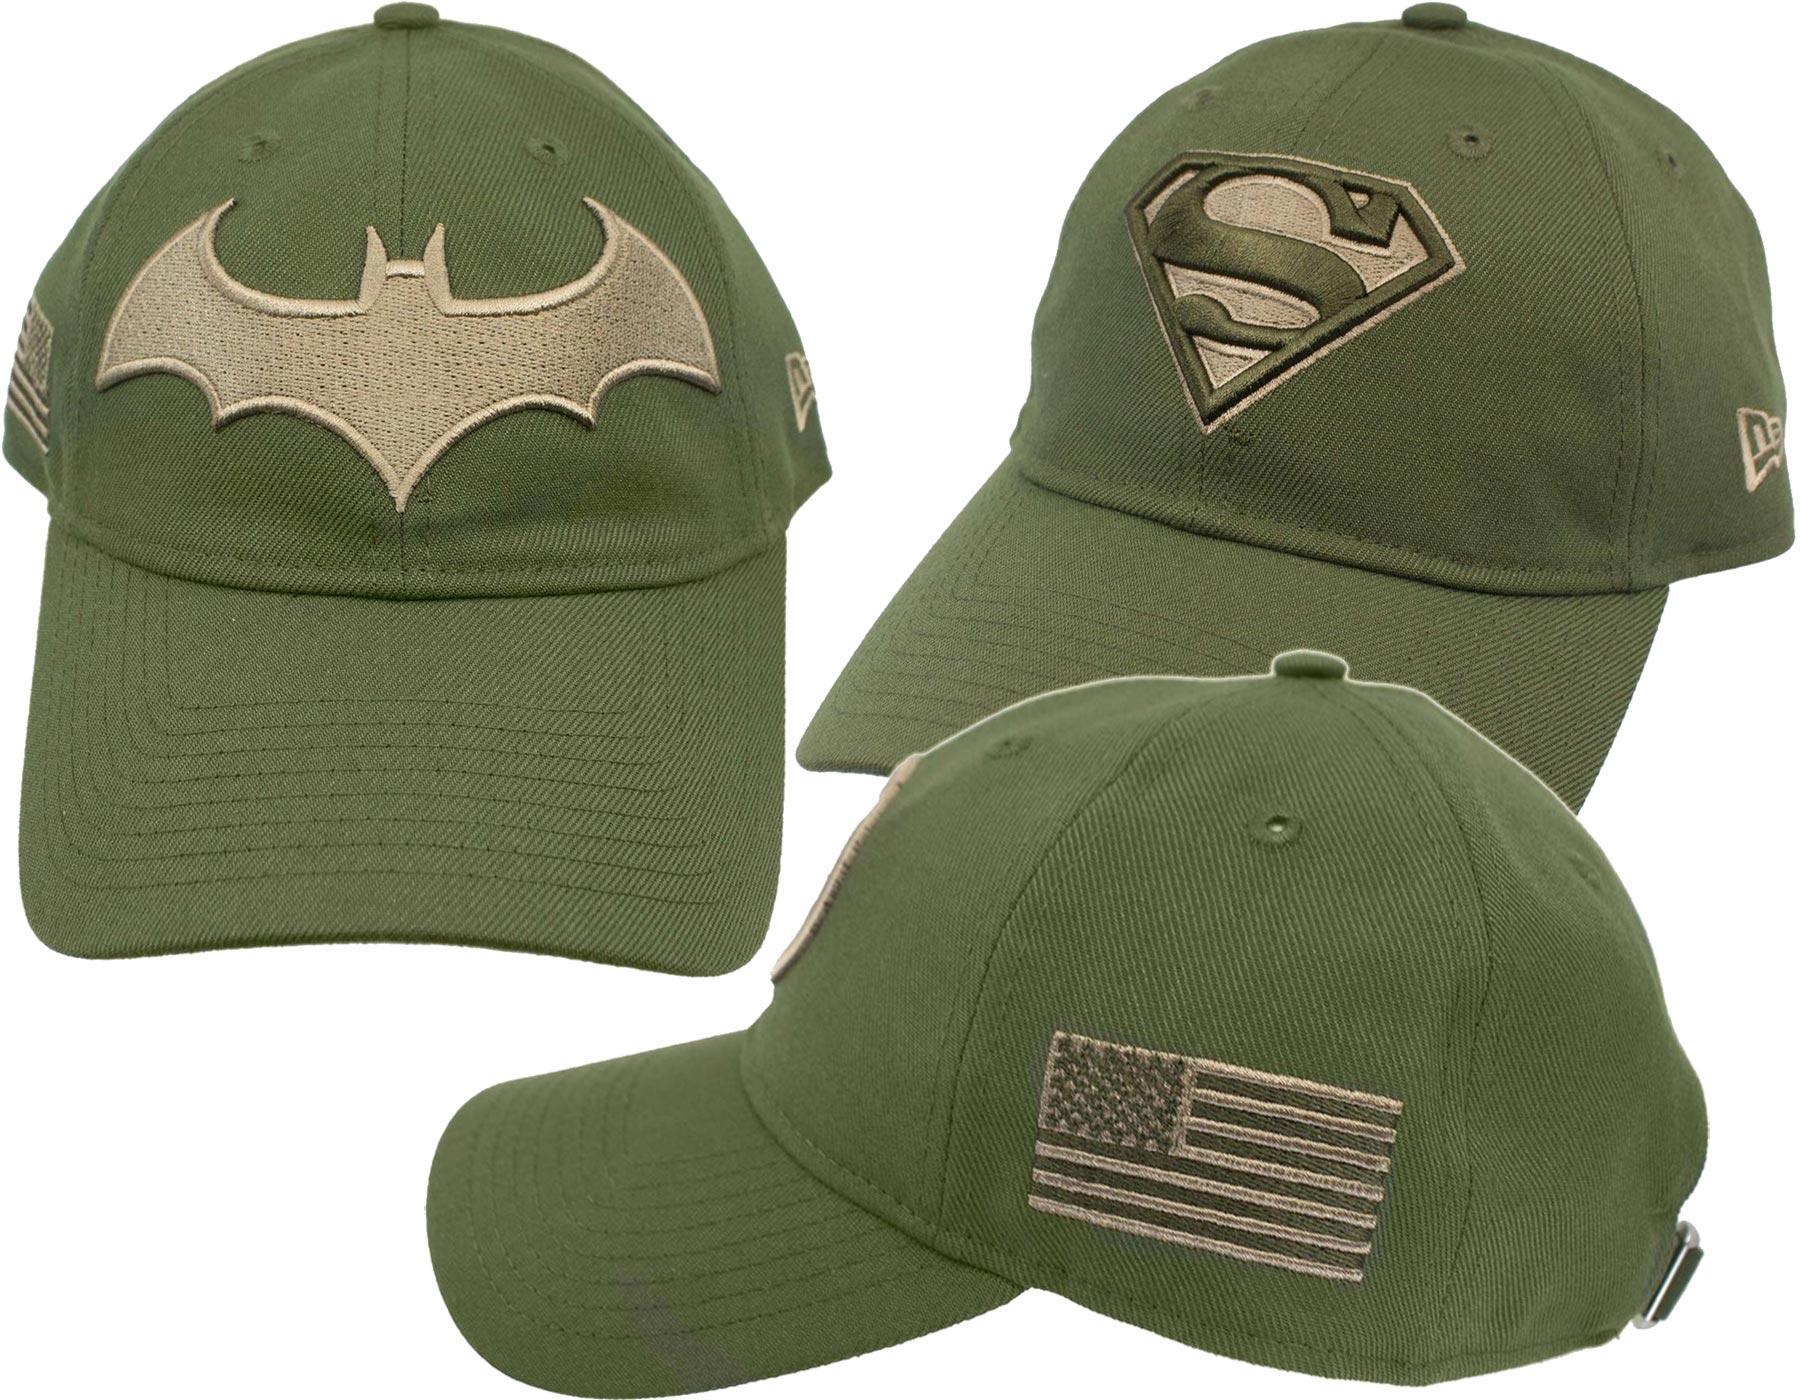 85f5a086315 DC Comics Salute to Service 9Twenty Adjustable Hats